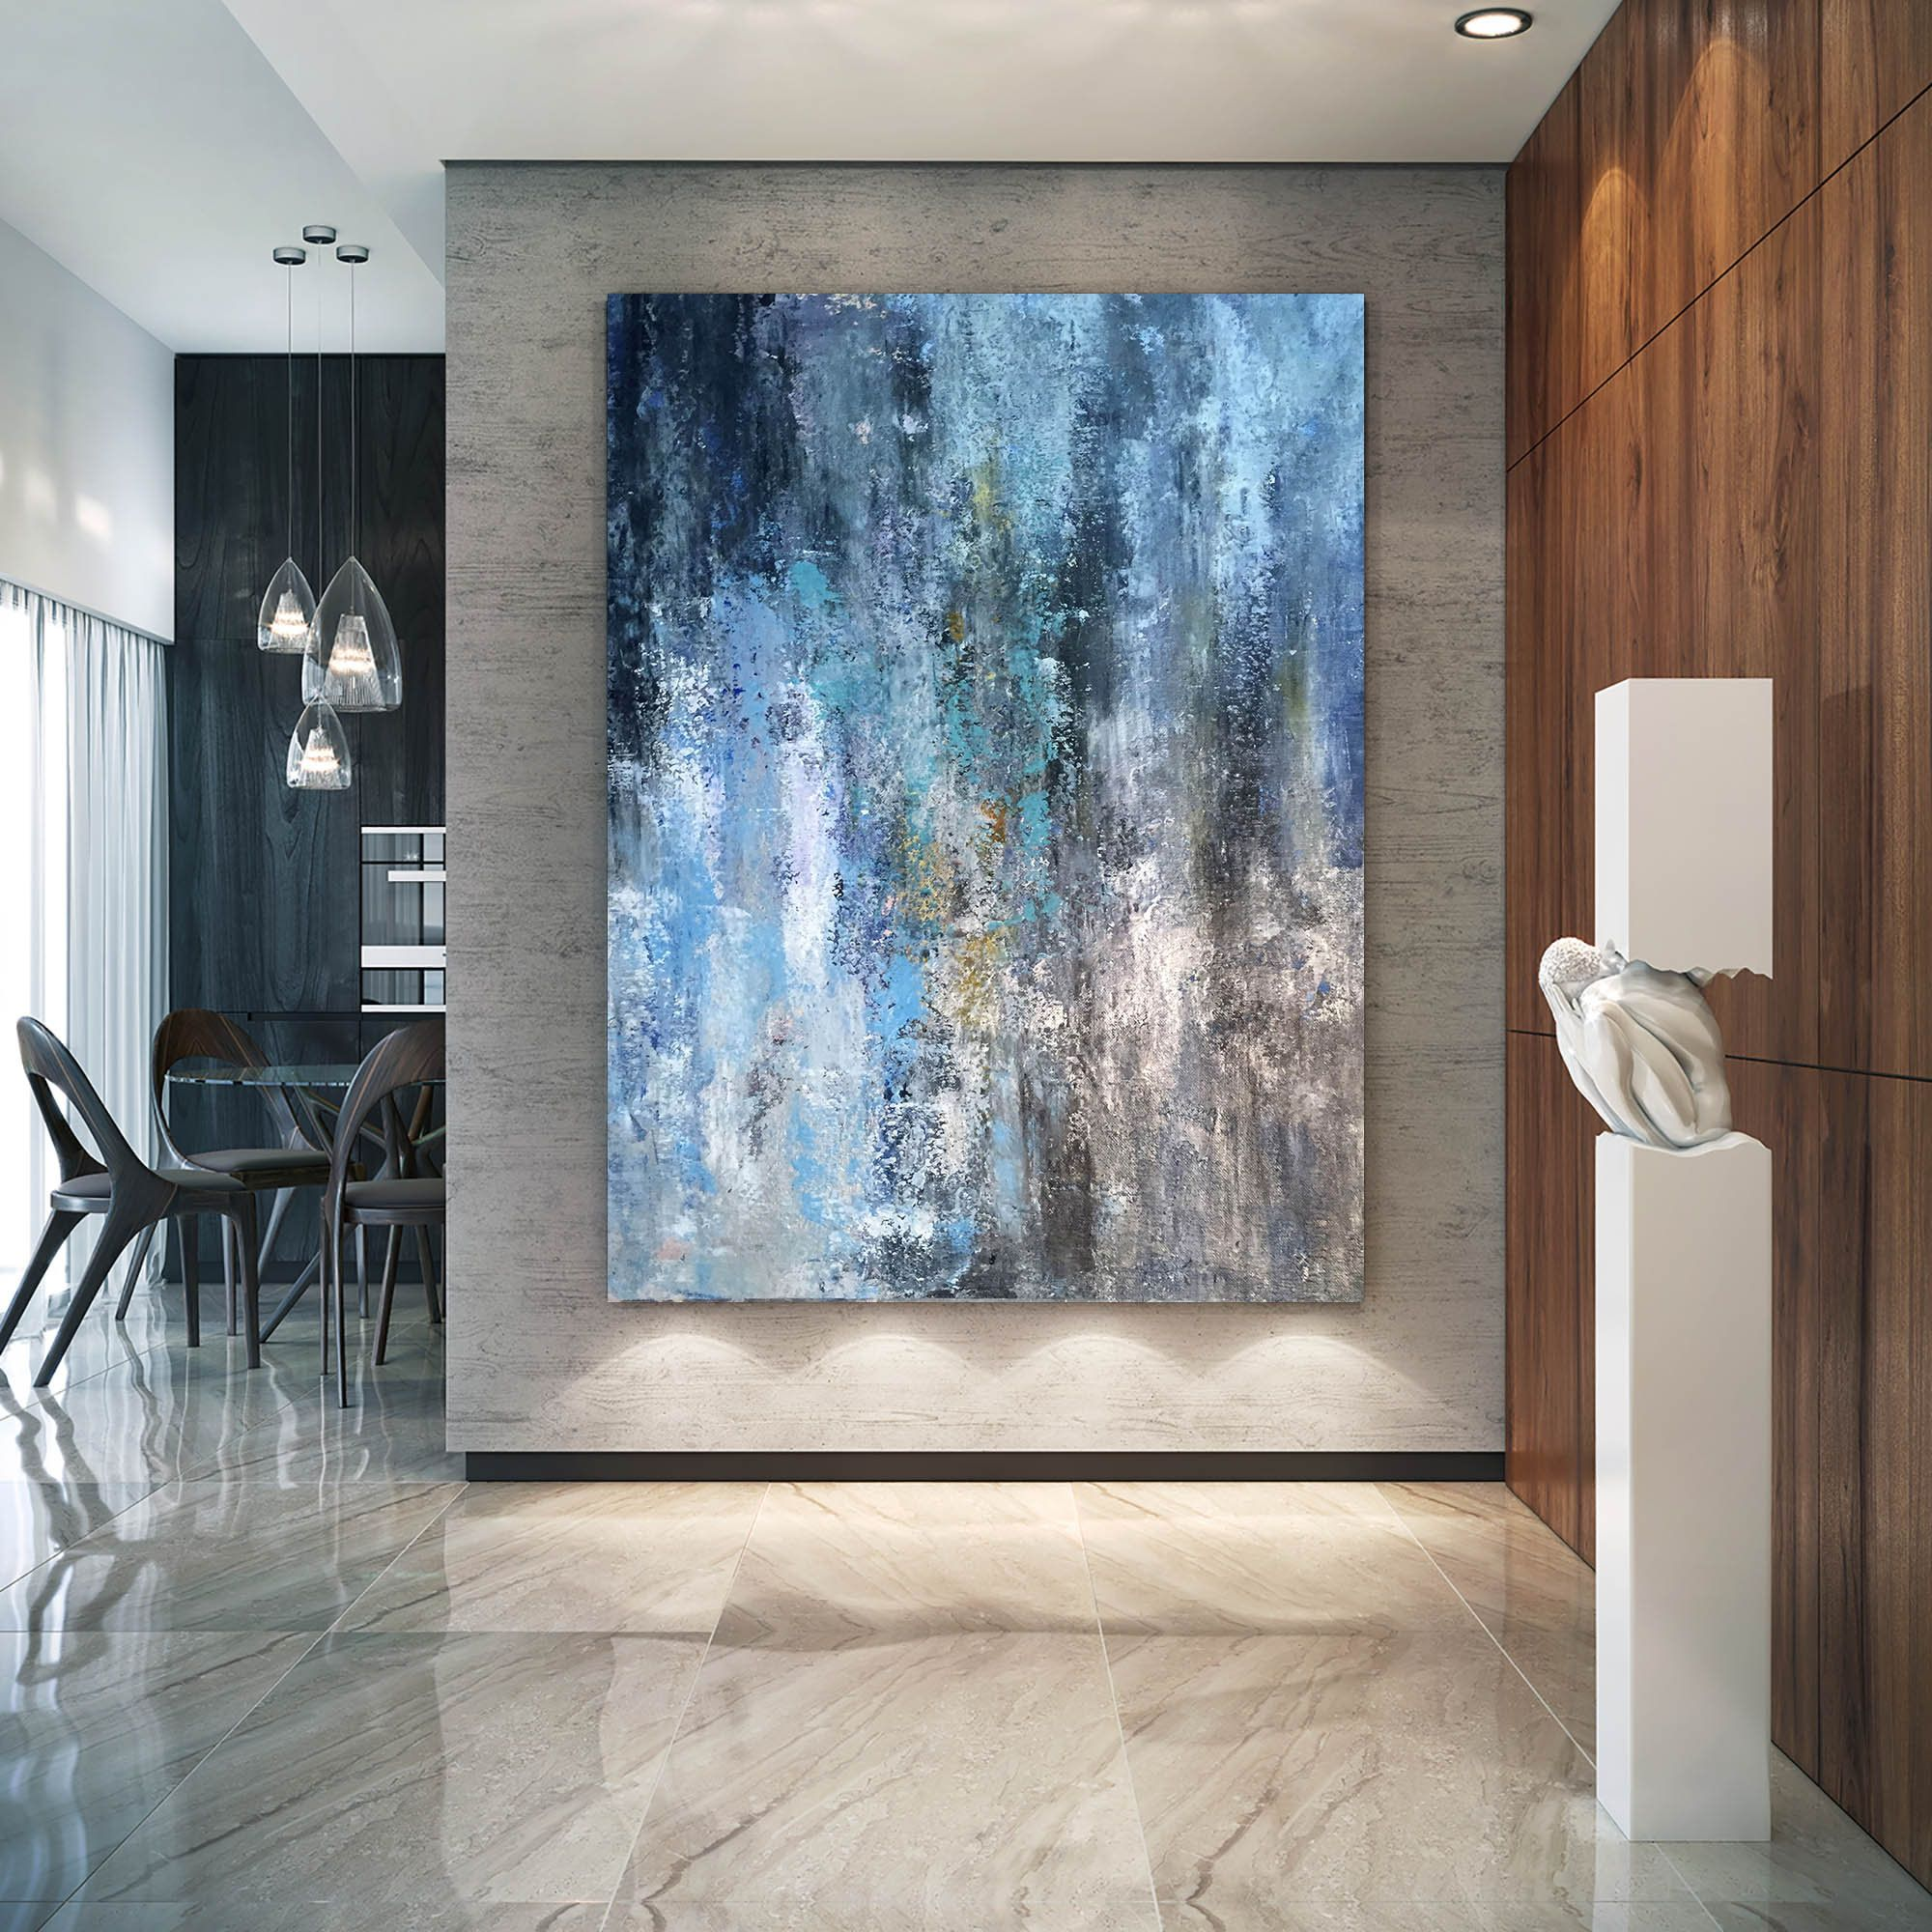 Large Modern Wall Art Paintinglarge Abstract Painting On Etsy In 2020 Large Modern Wall Art Extra Large Wall Art Large Wall Art